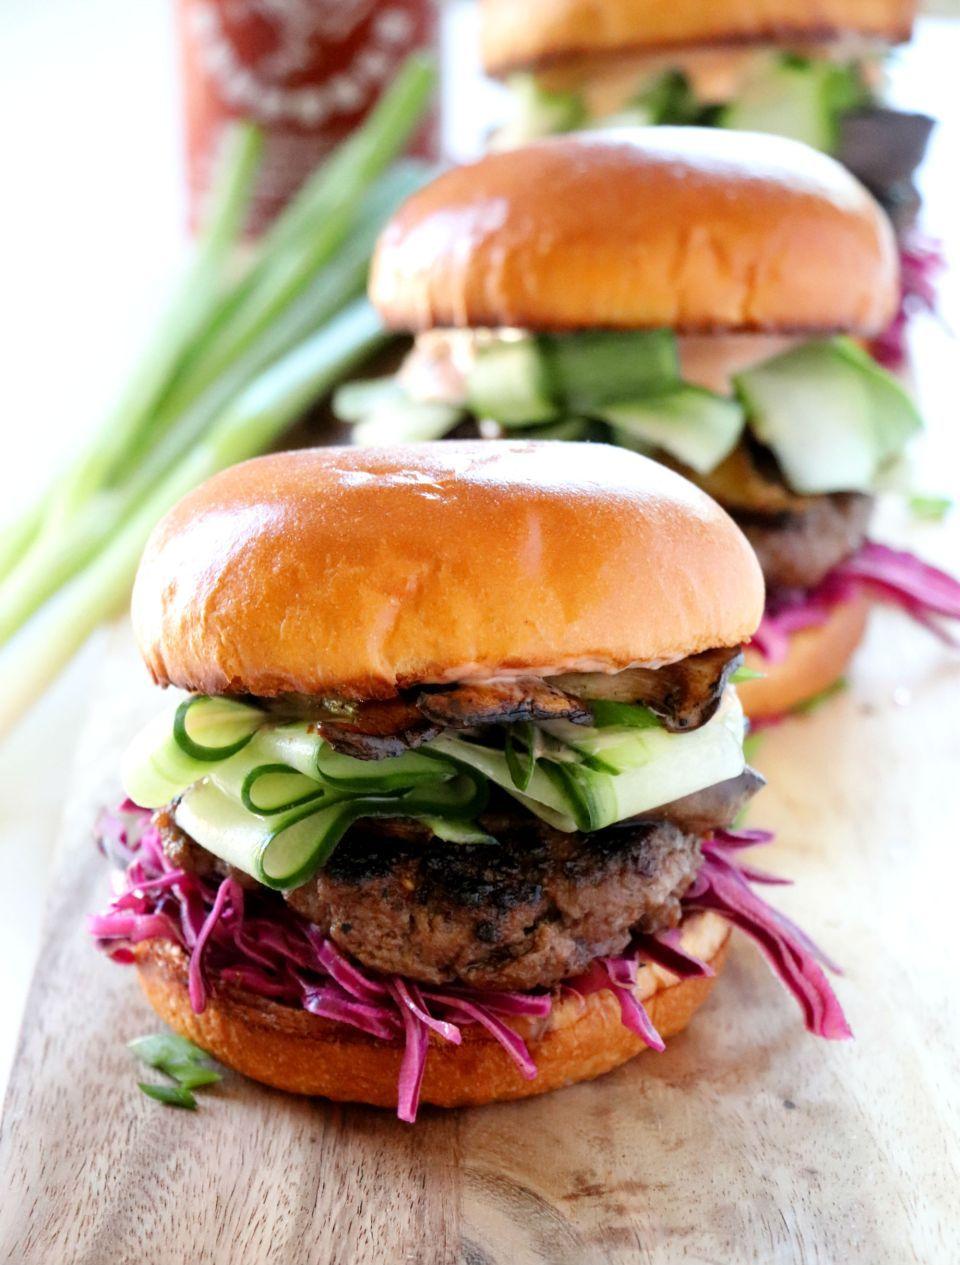 Asian Burger Dash Of Savory Cook With Passion Recipe Gourmet Burgers Food Burger